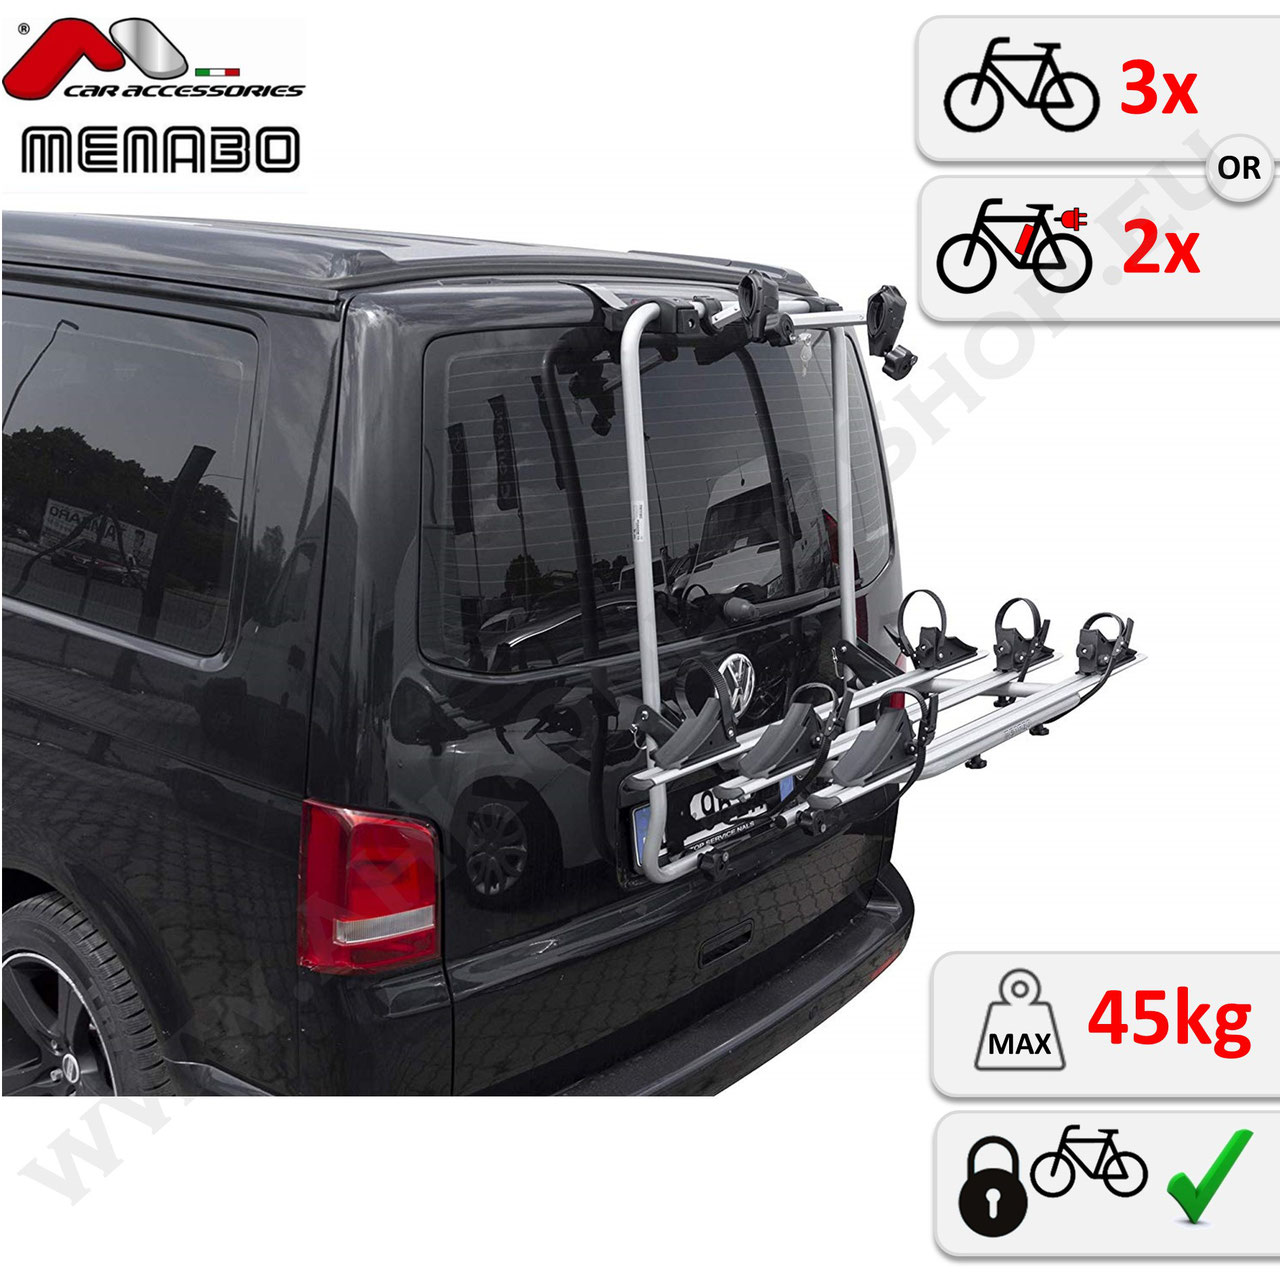 3 Fahrräder NEU PKW Menabo Fahrradträger Stand Up 3 VW Sharan Typ 7N